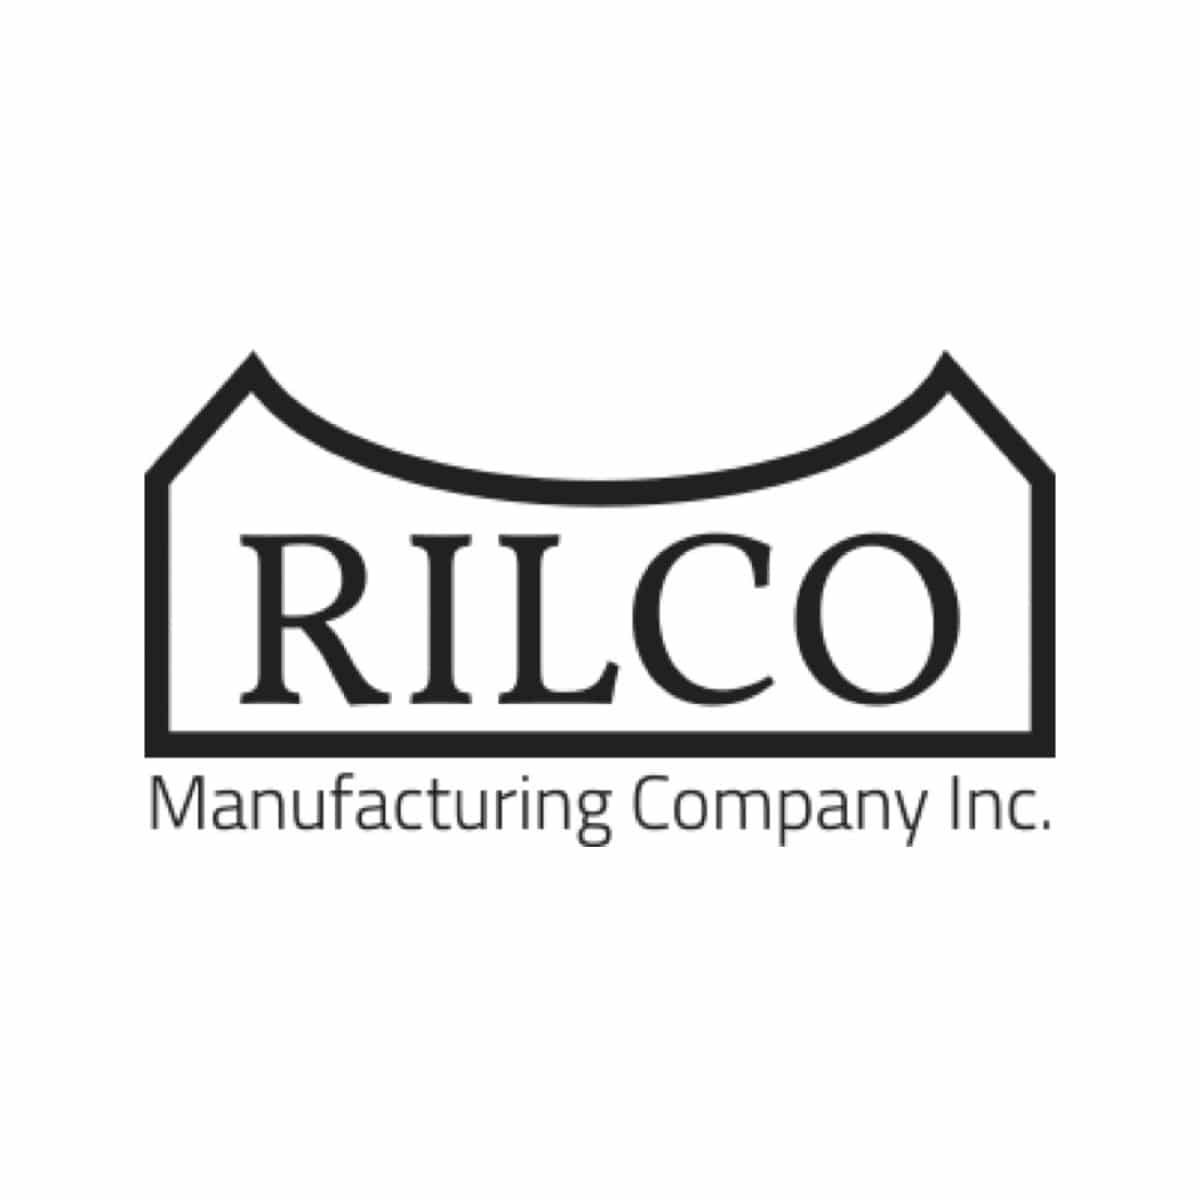 Rilco Manufacturing